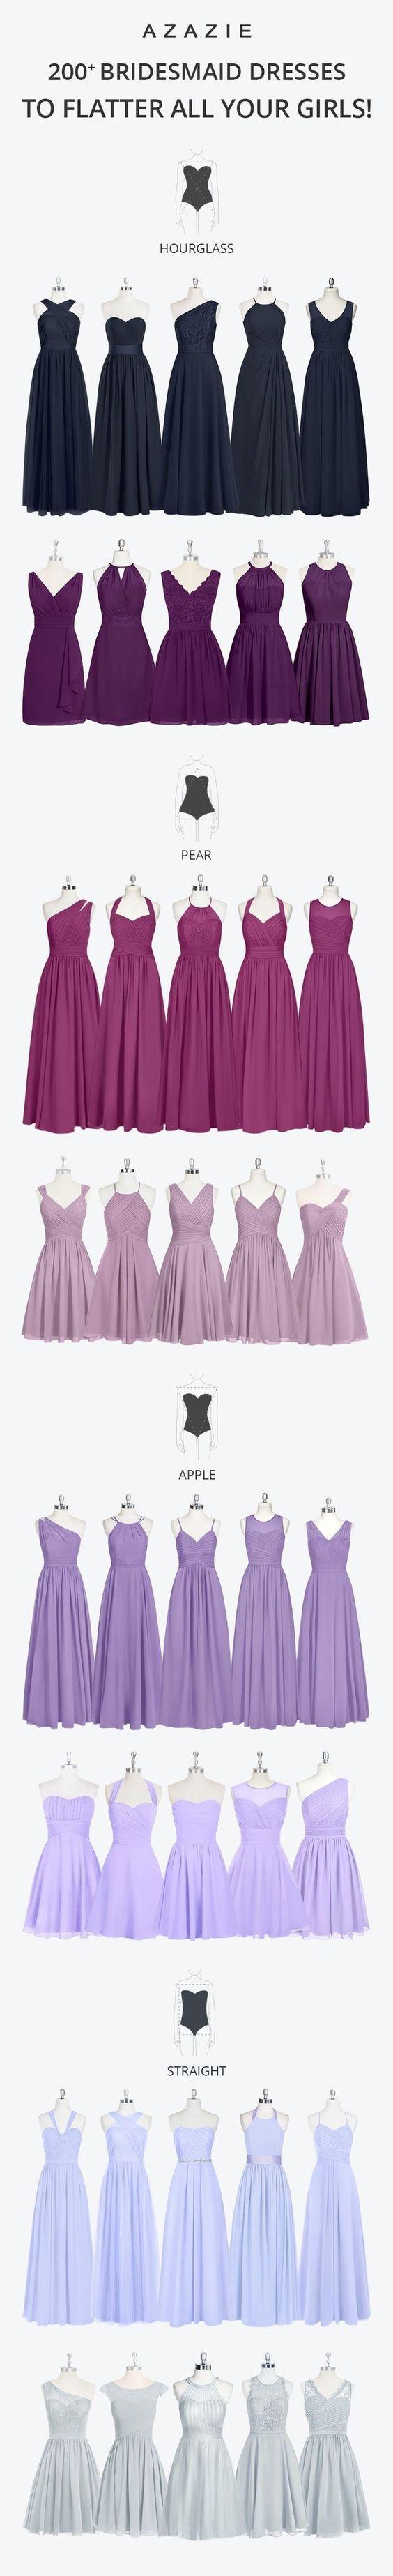 475 best bridesmaids dress images on Pinterest | Bridesmaids ...